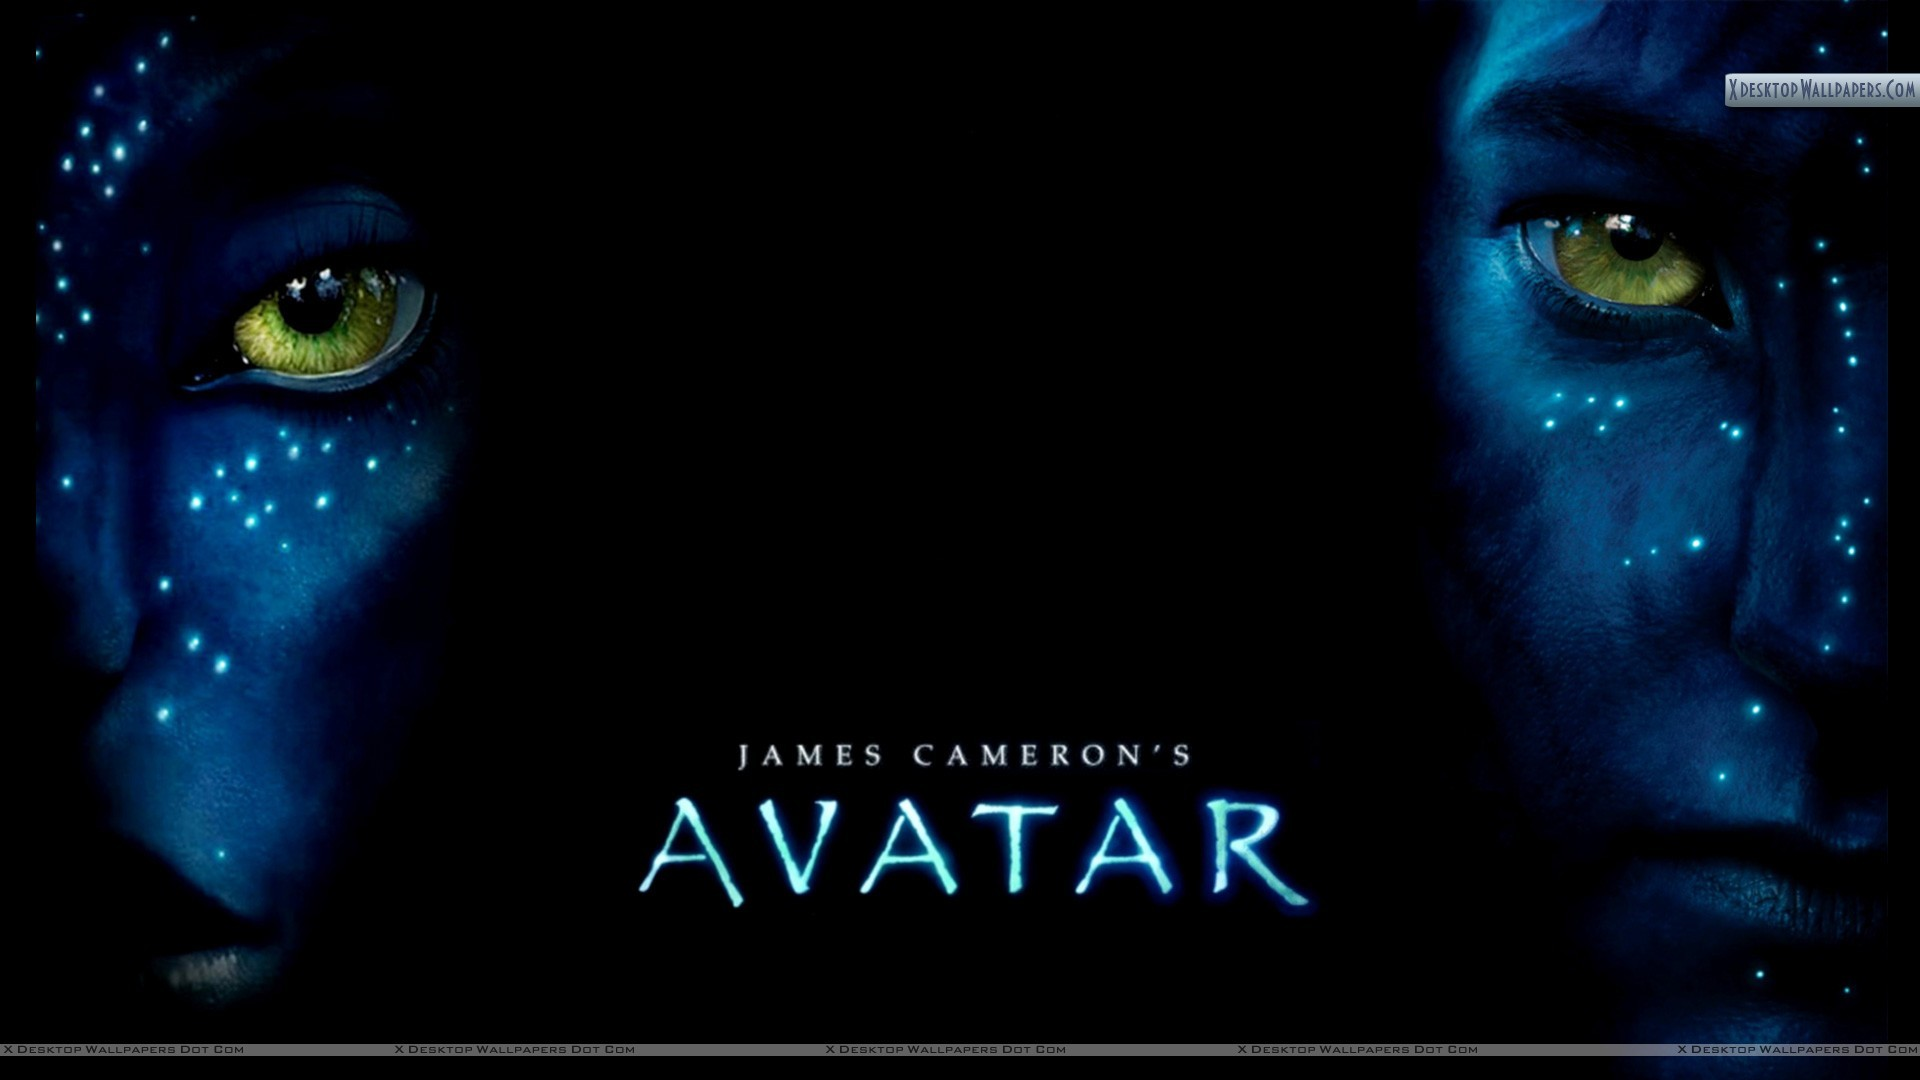 Avatar Movie Poster Wallpaper